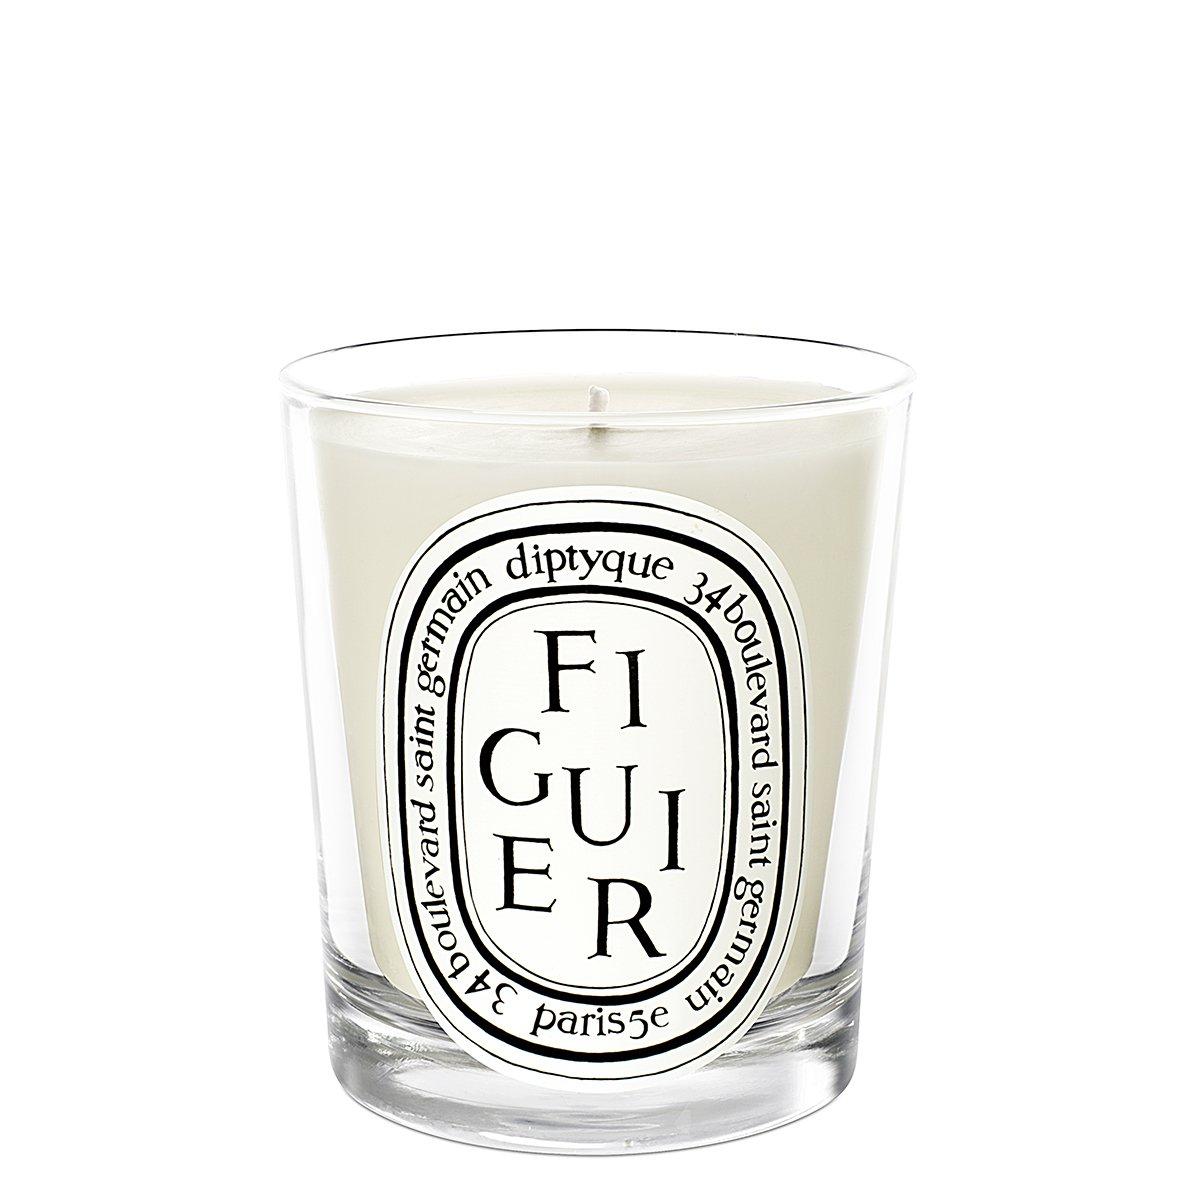 Diptyque Figuier Candle. #diptyque #figuier #fig #candle #paris